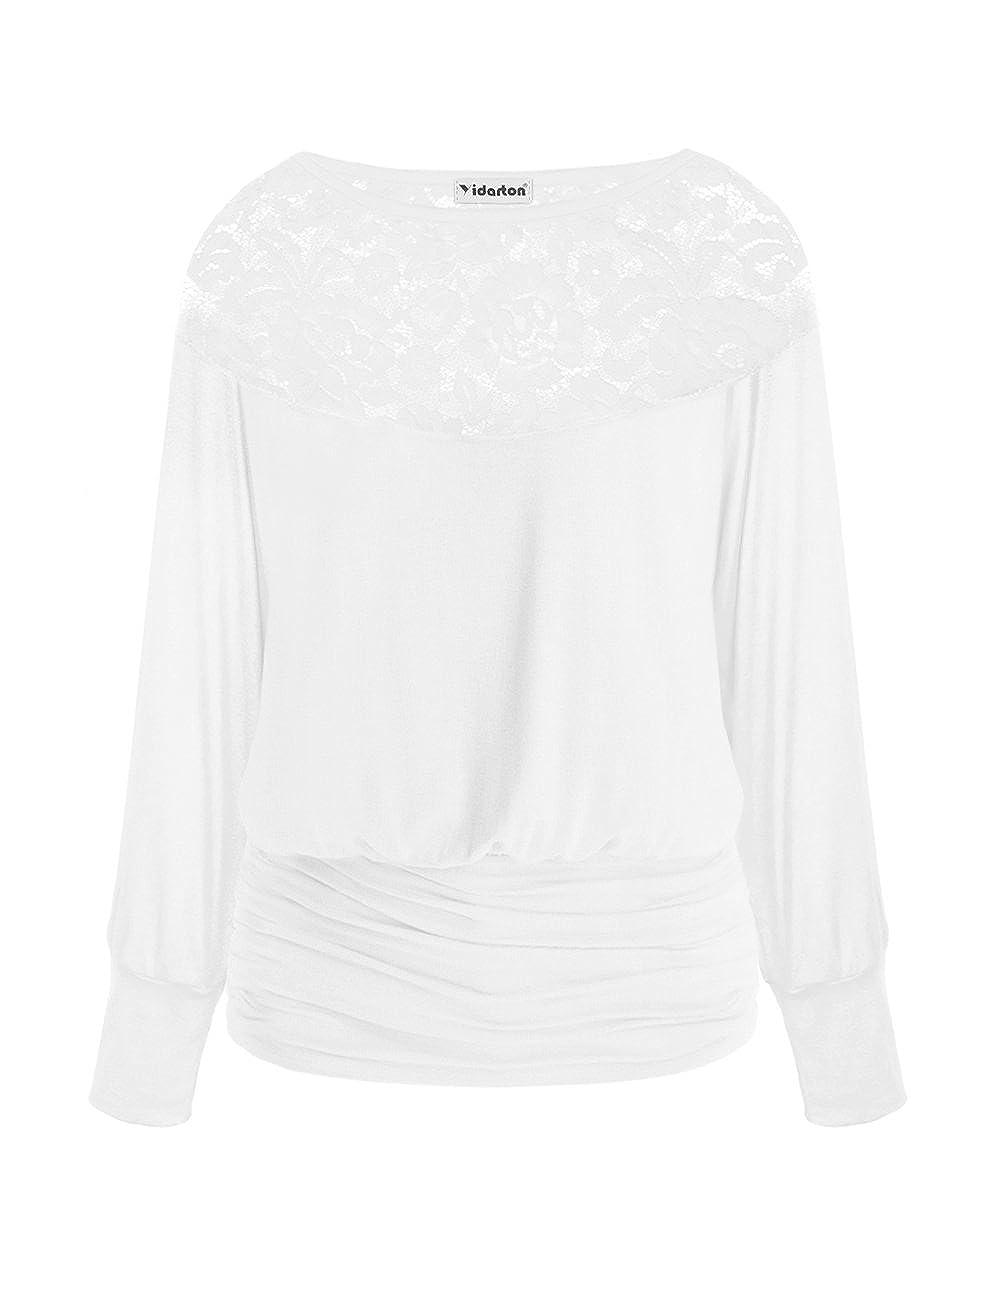 a8675deb006a Yidarton Top Blouse Manche Longue Femme š€ Col Rond Dentelle Creux Casual  Tee Shirt Haut Mode (M